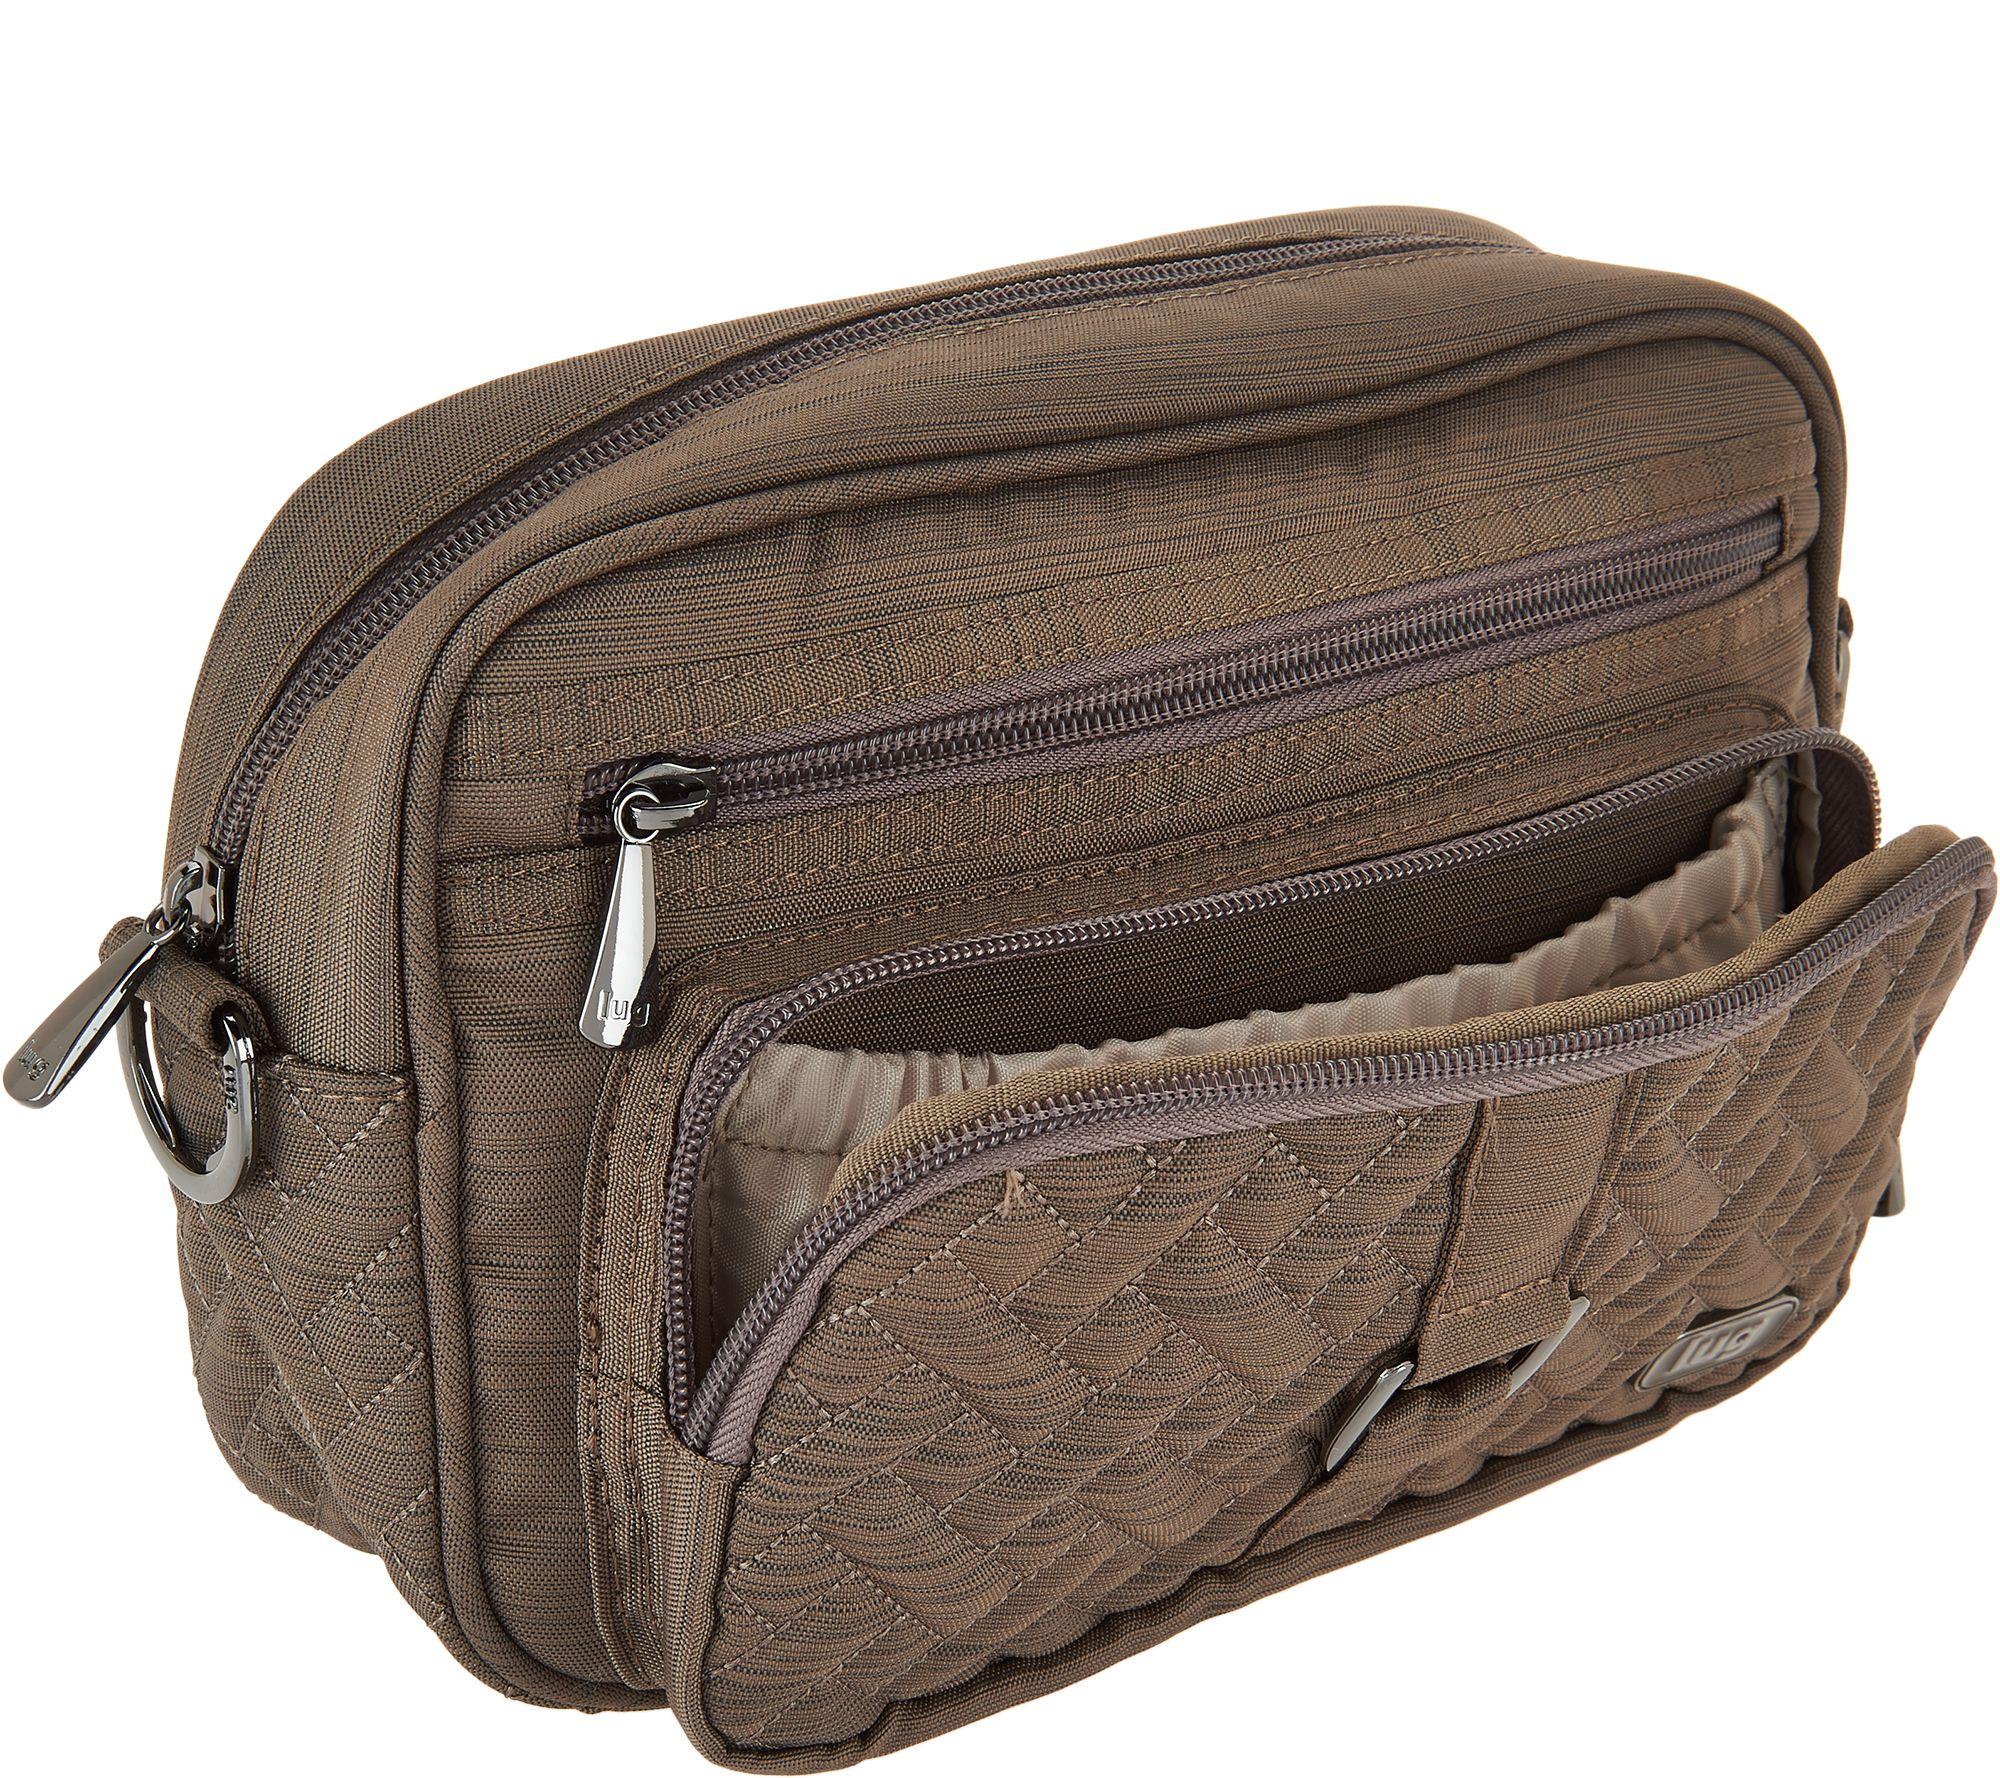 0018432e944f30 Lug Convertible RFID Crossbody and Belt Bag - Carousel - Page 1 — QVC.com